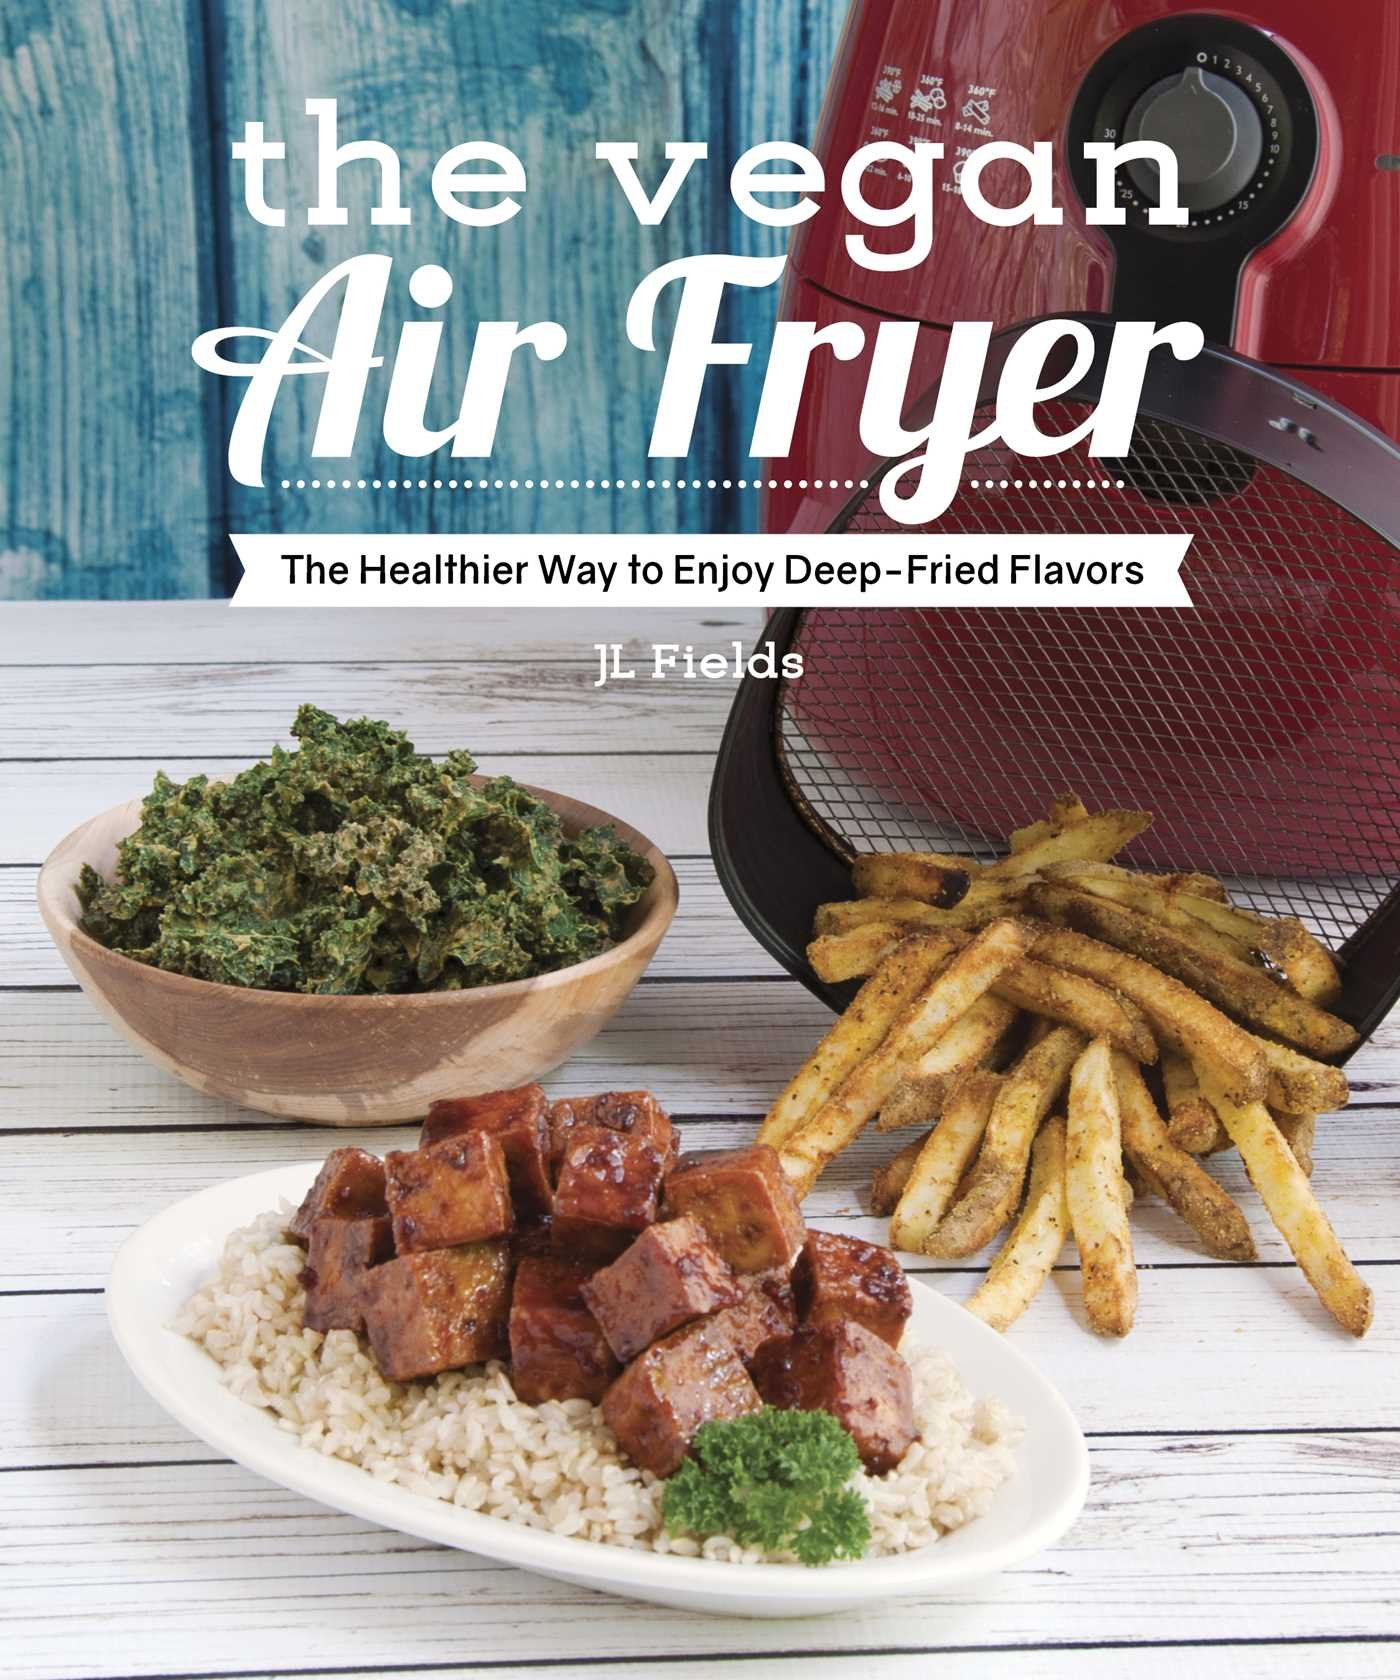 The-Vegan-Air-Fryer-The-Healthier-Way-to-Enjoy-Deep-Fried-Flavors